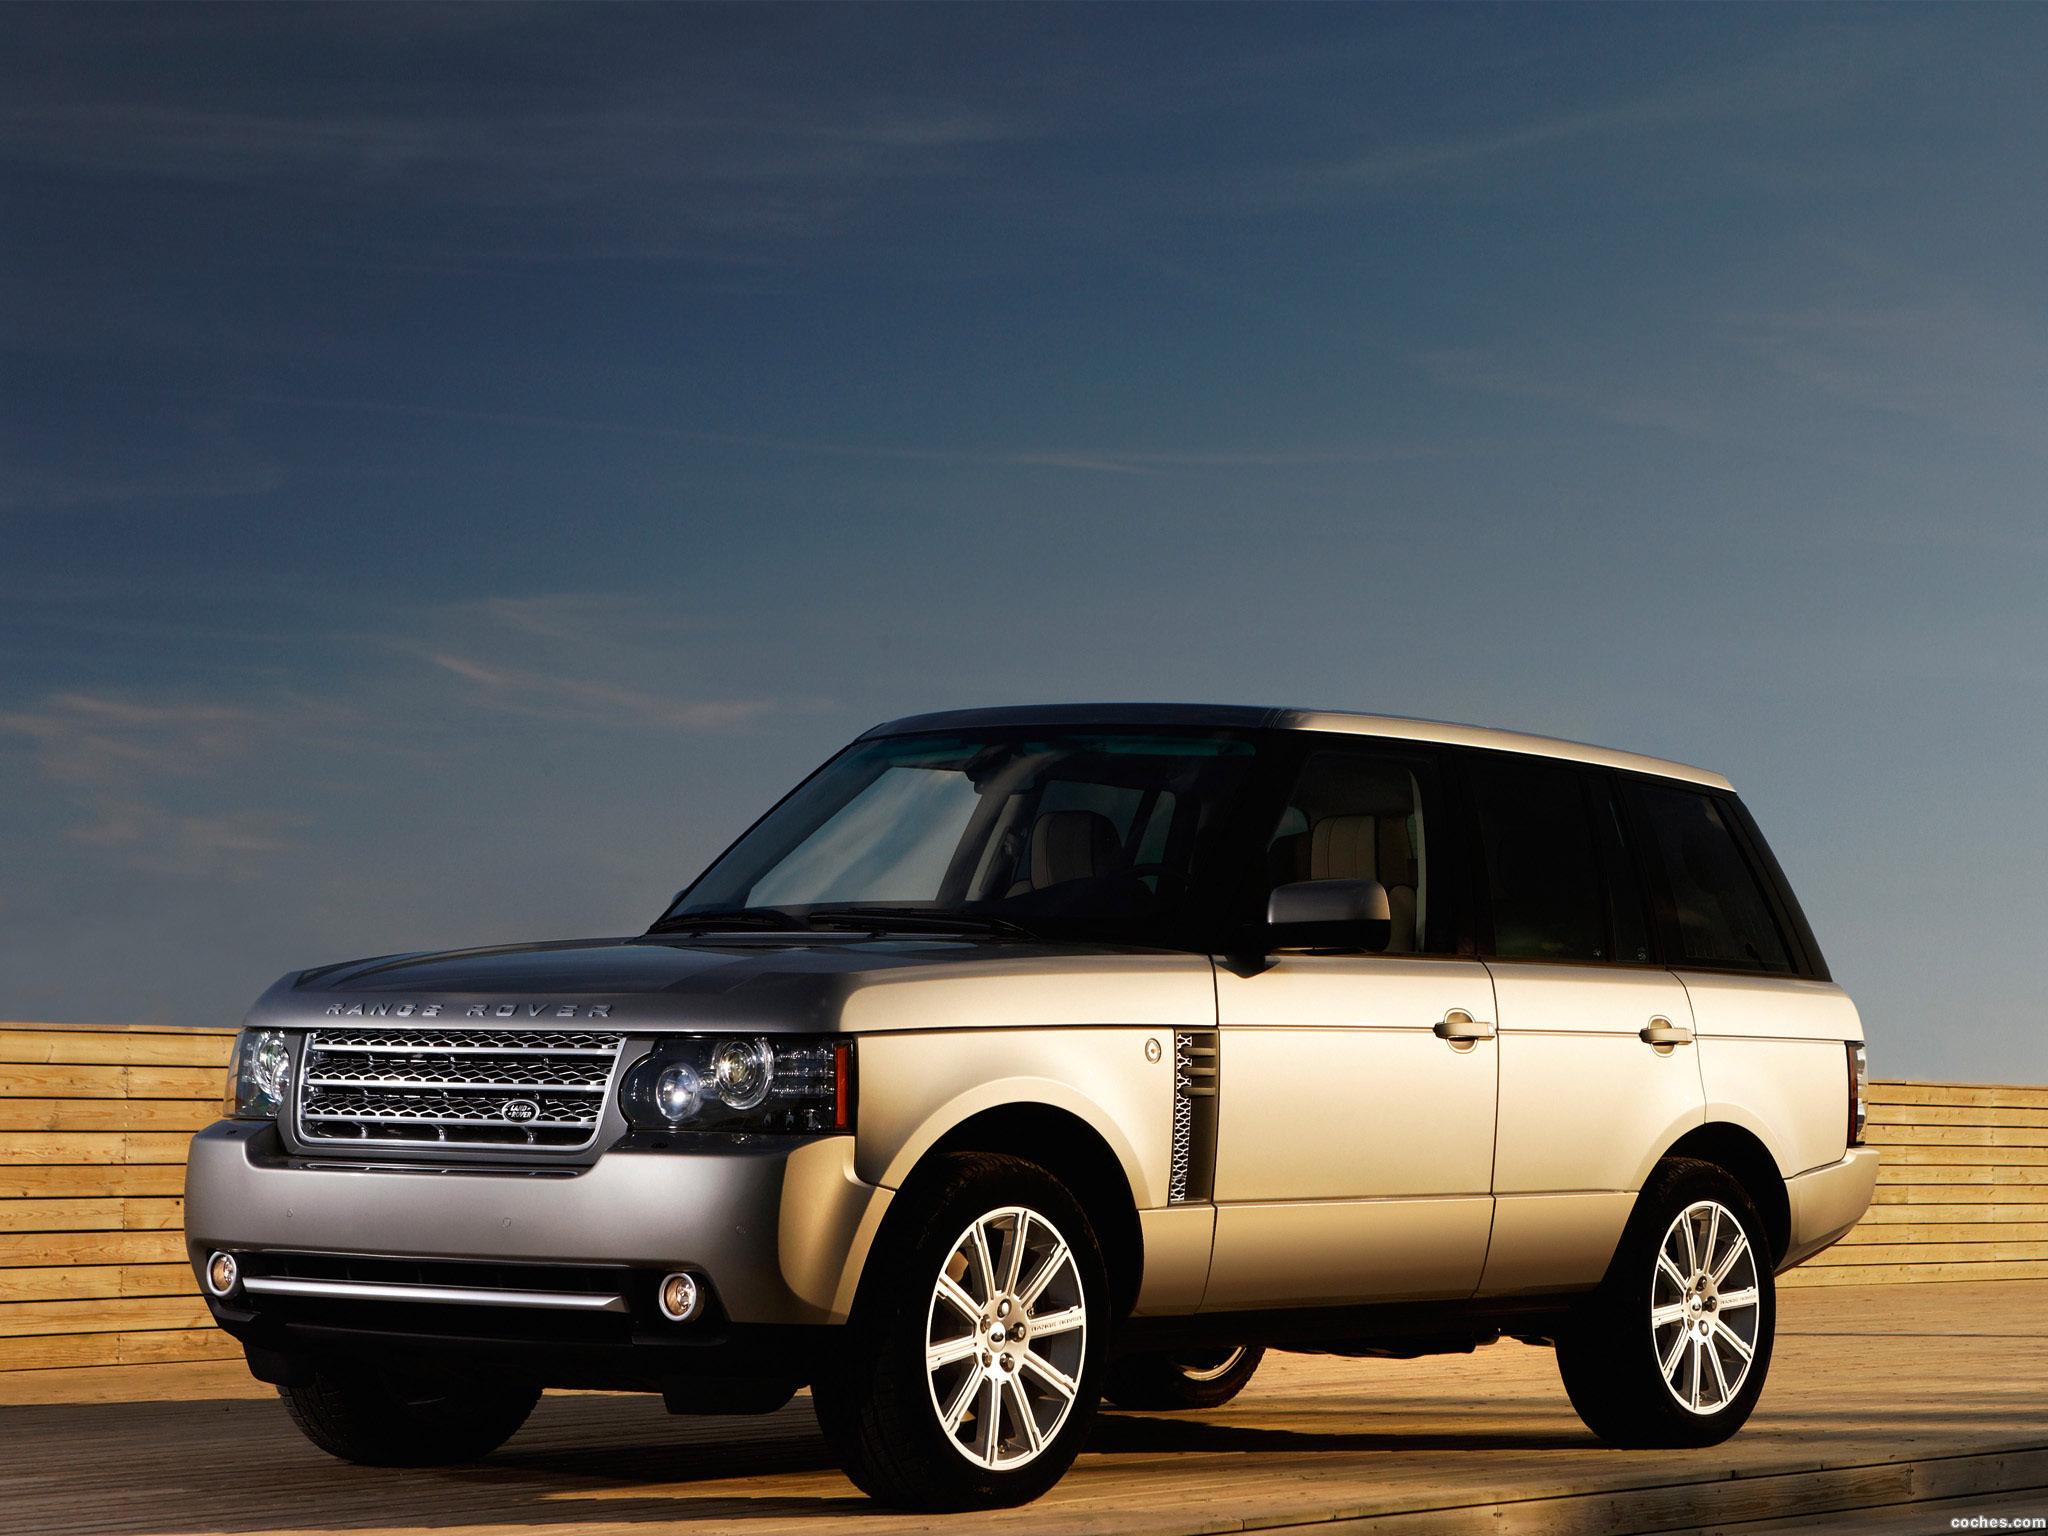 Foto 0 de Land Rover Range Rover Autobiography 2009